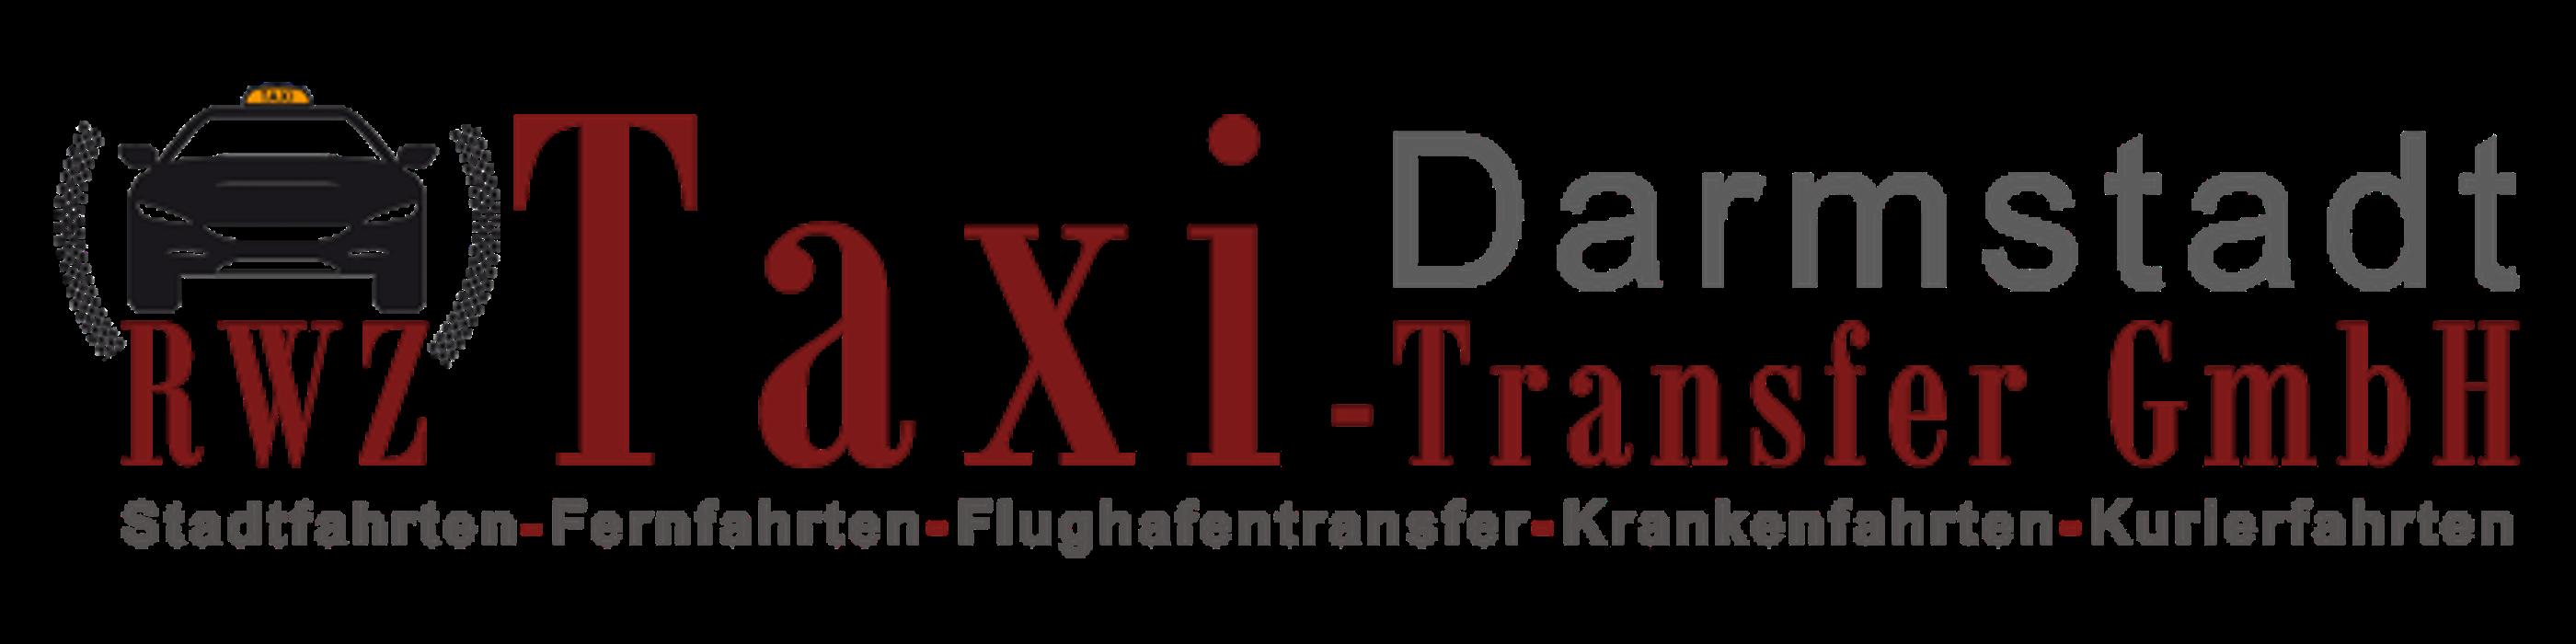 Bild zu RWZ Taxi-Transfer GmbH in Darmstadt